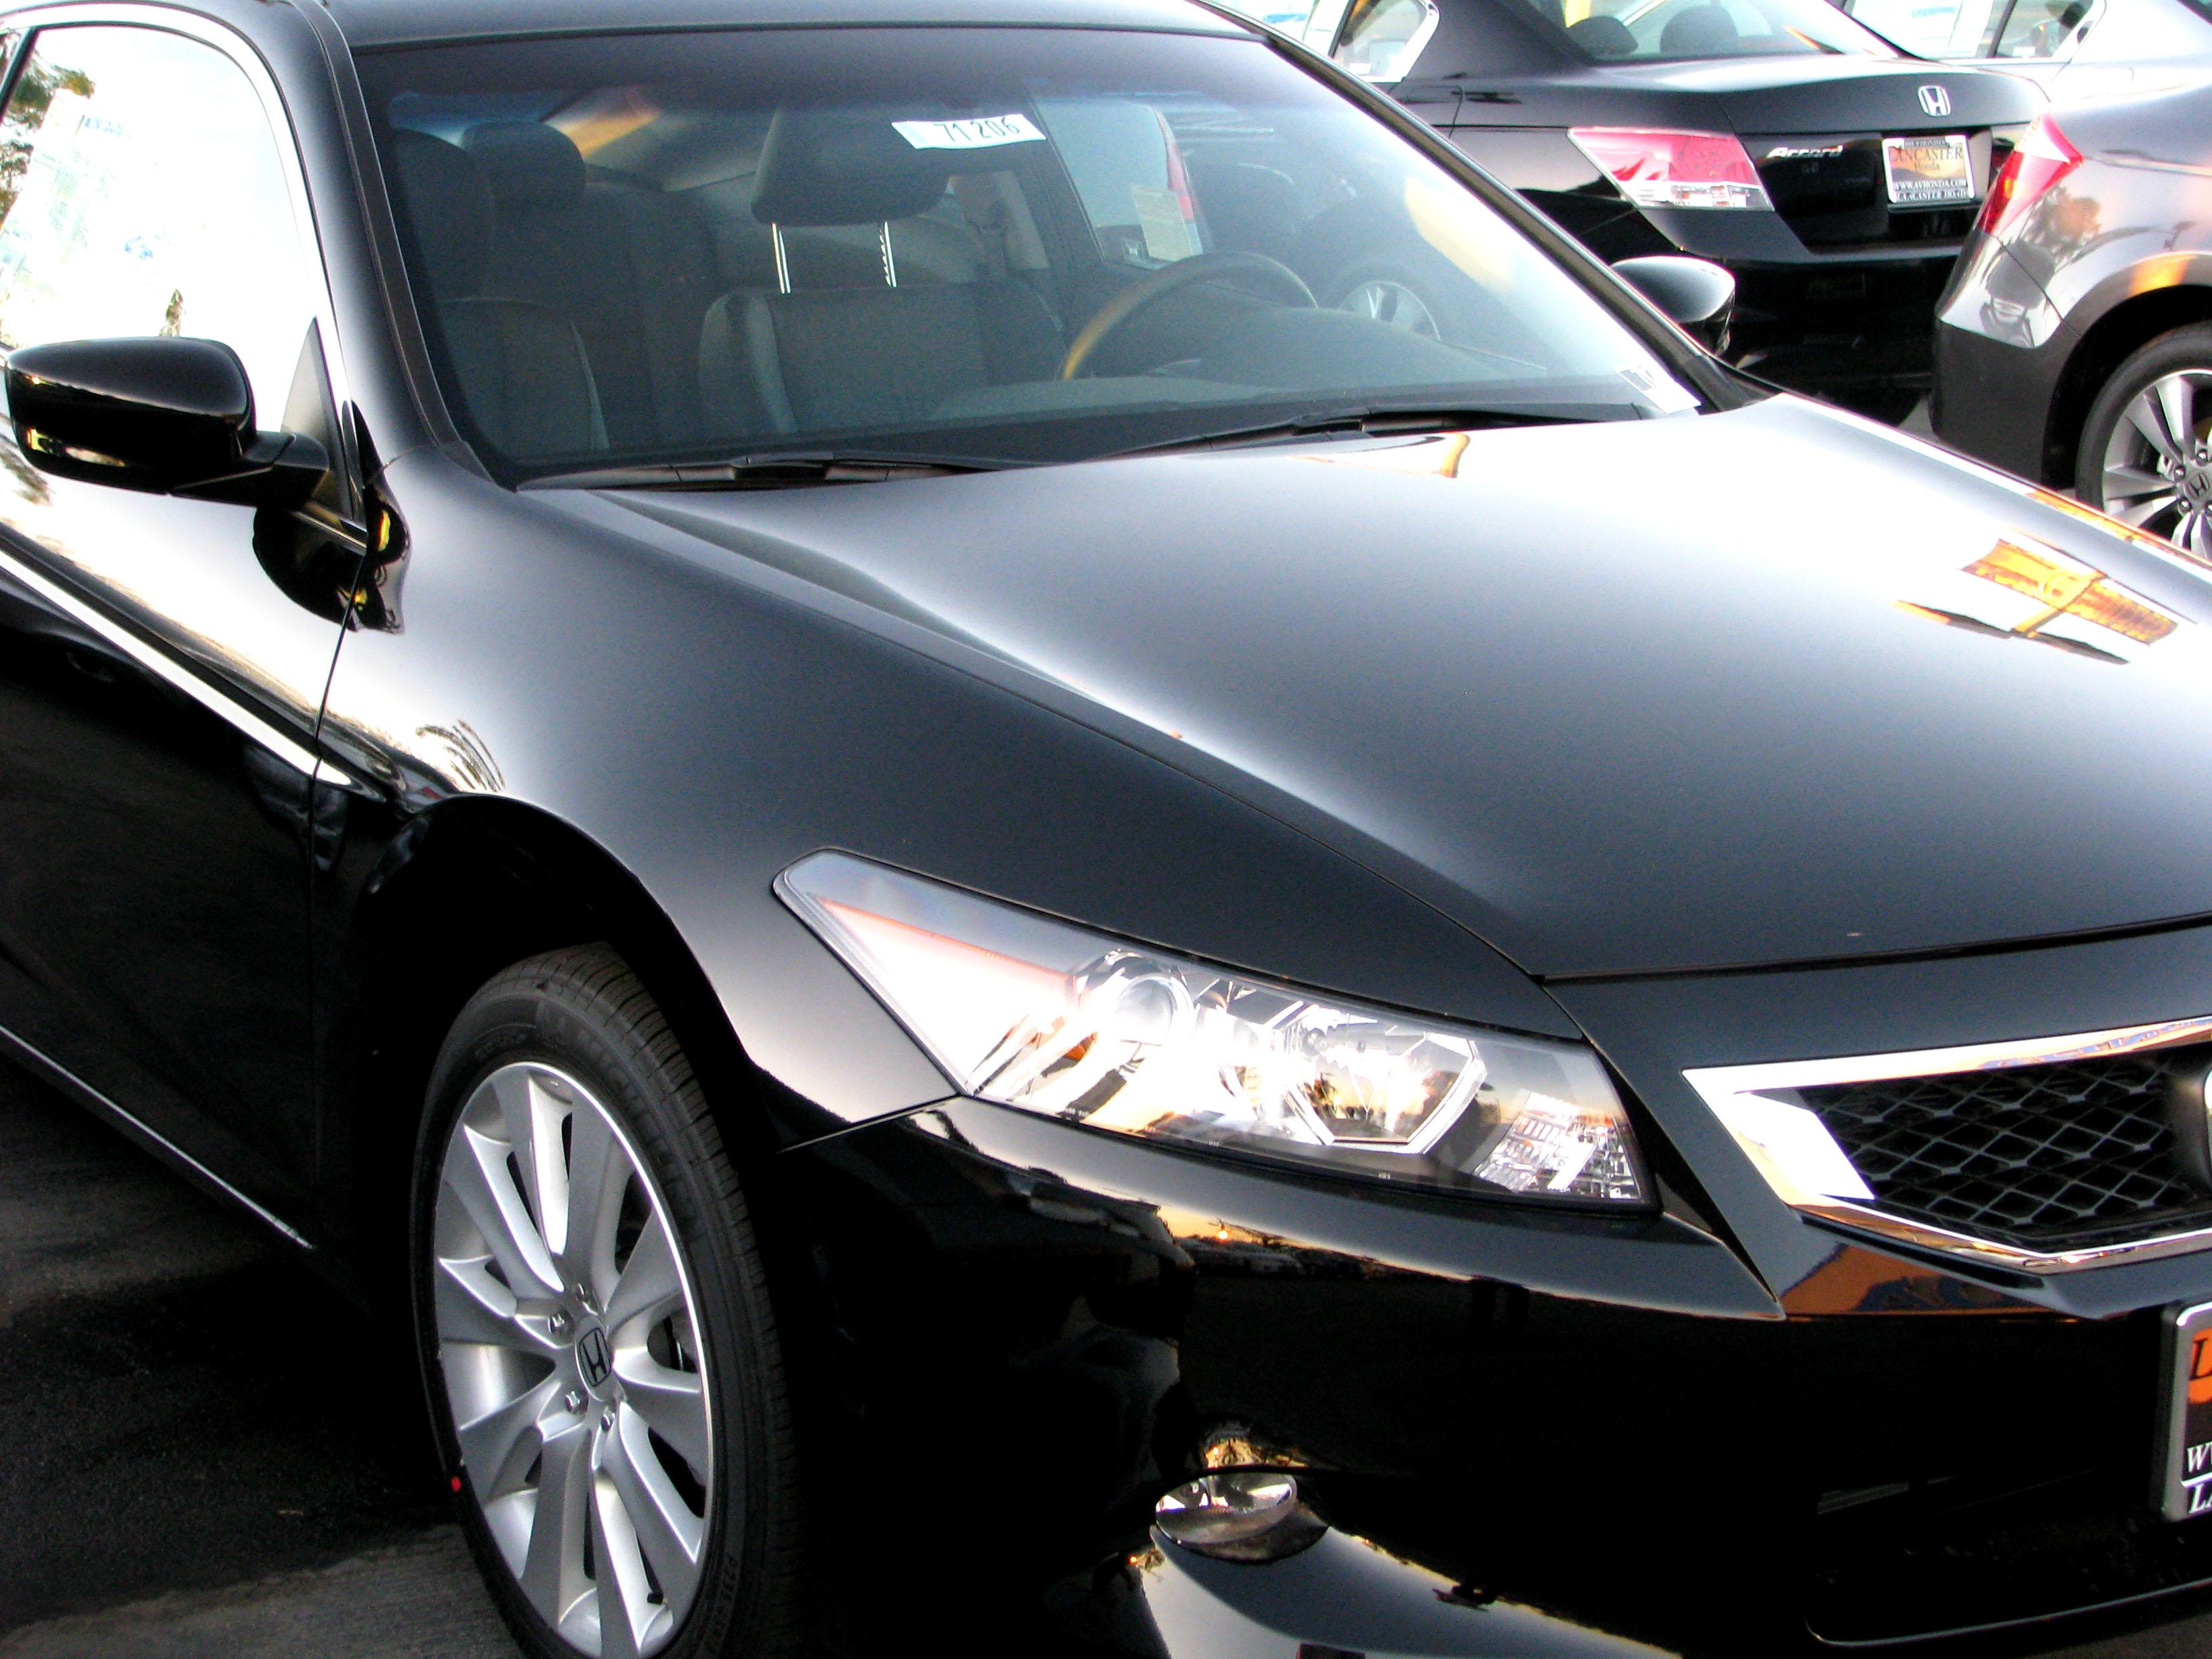 File:2009 Honda Accord Coupe (2954575247).jpg - Wikimedia Commons